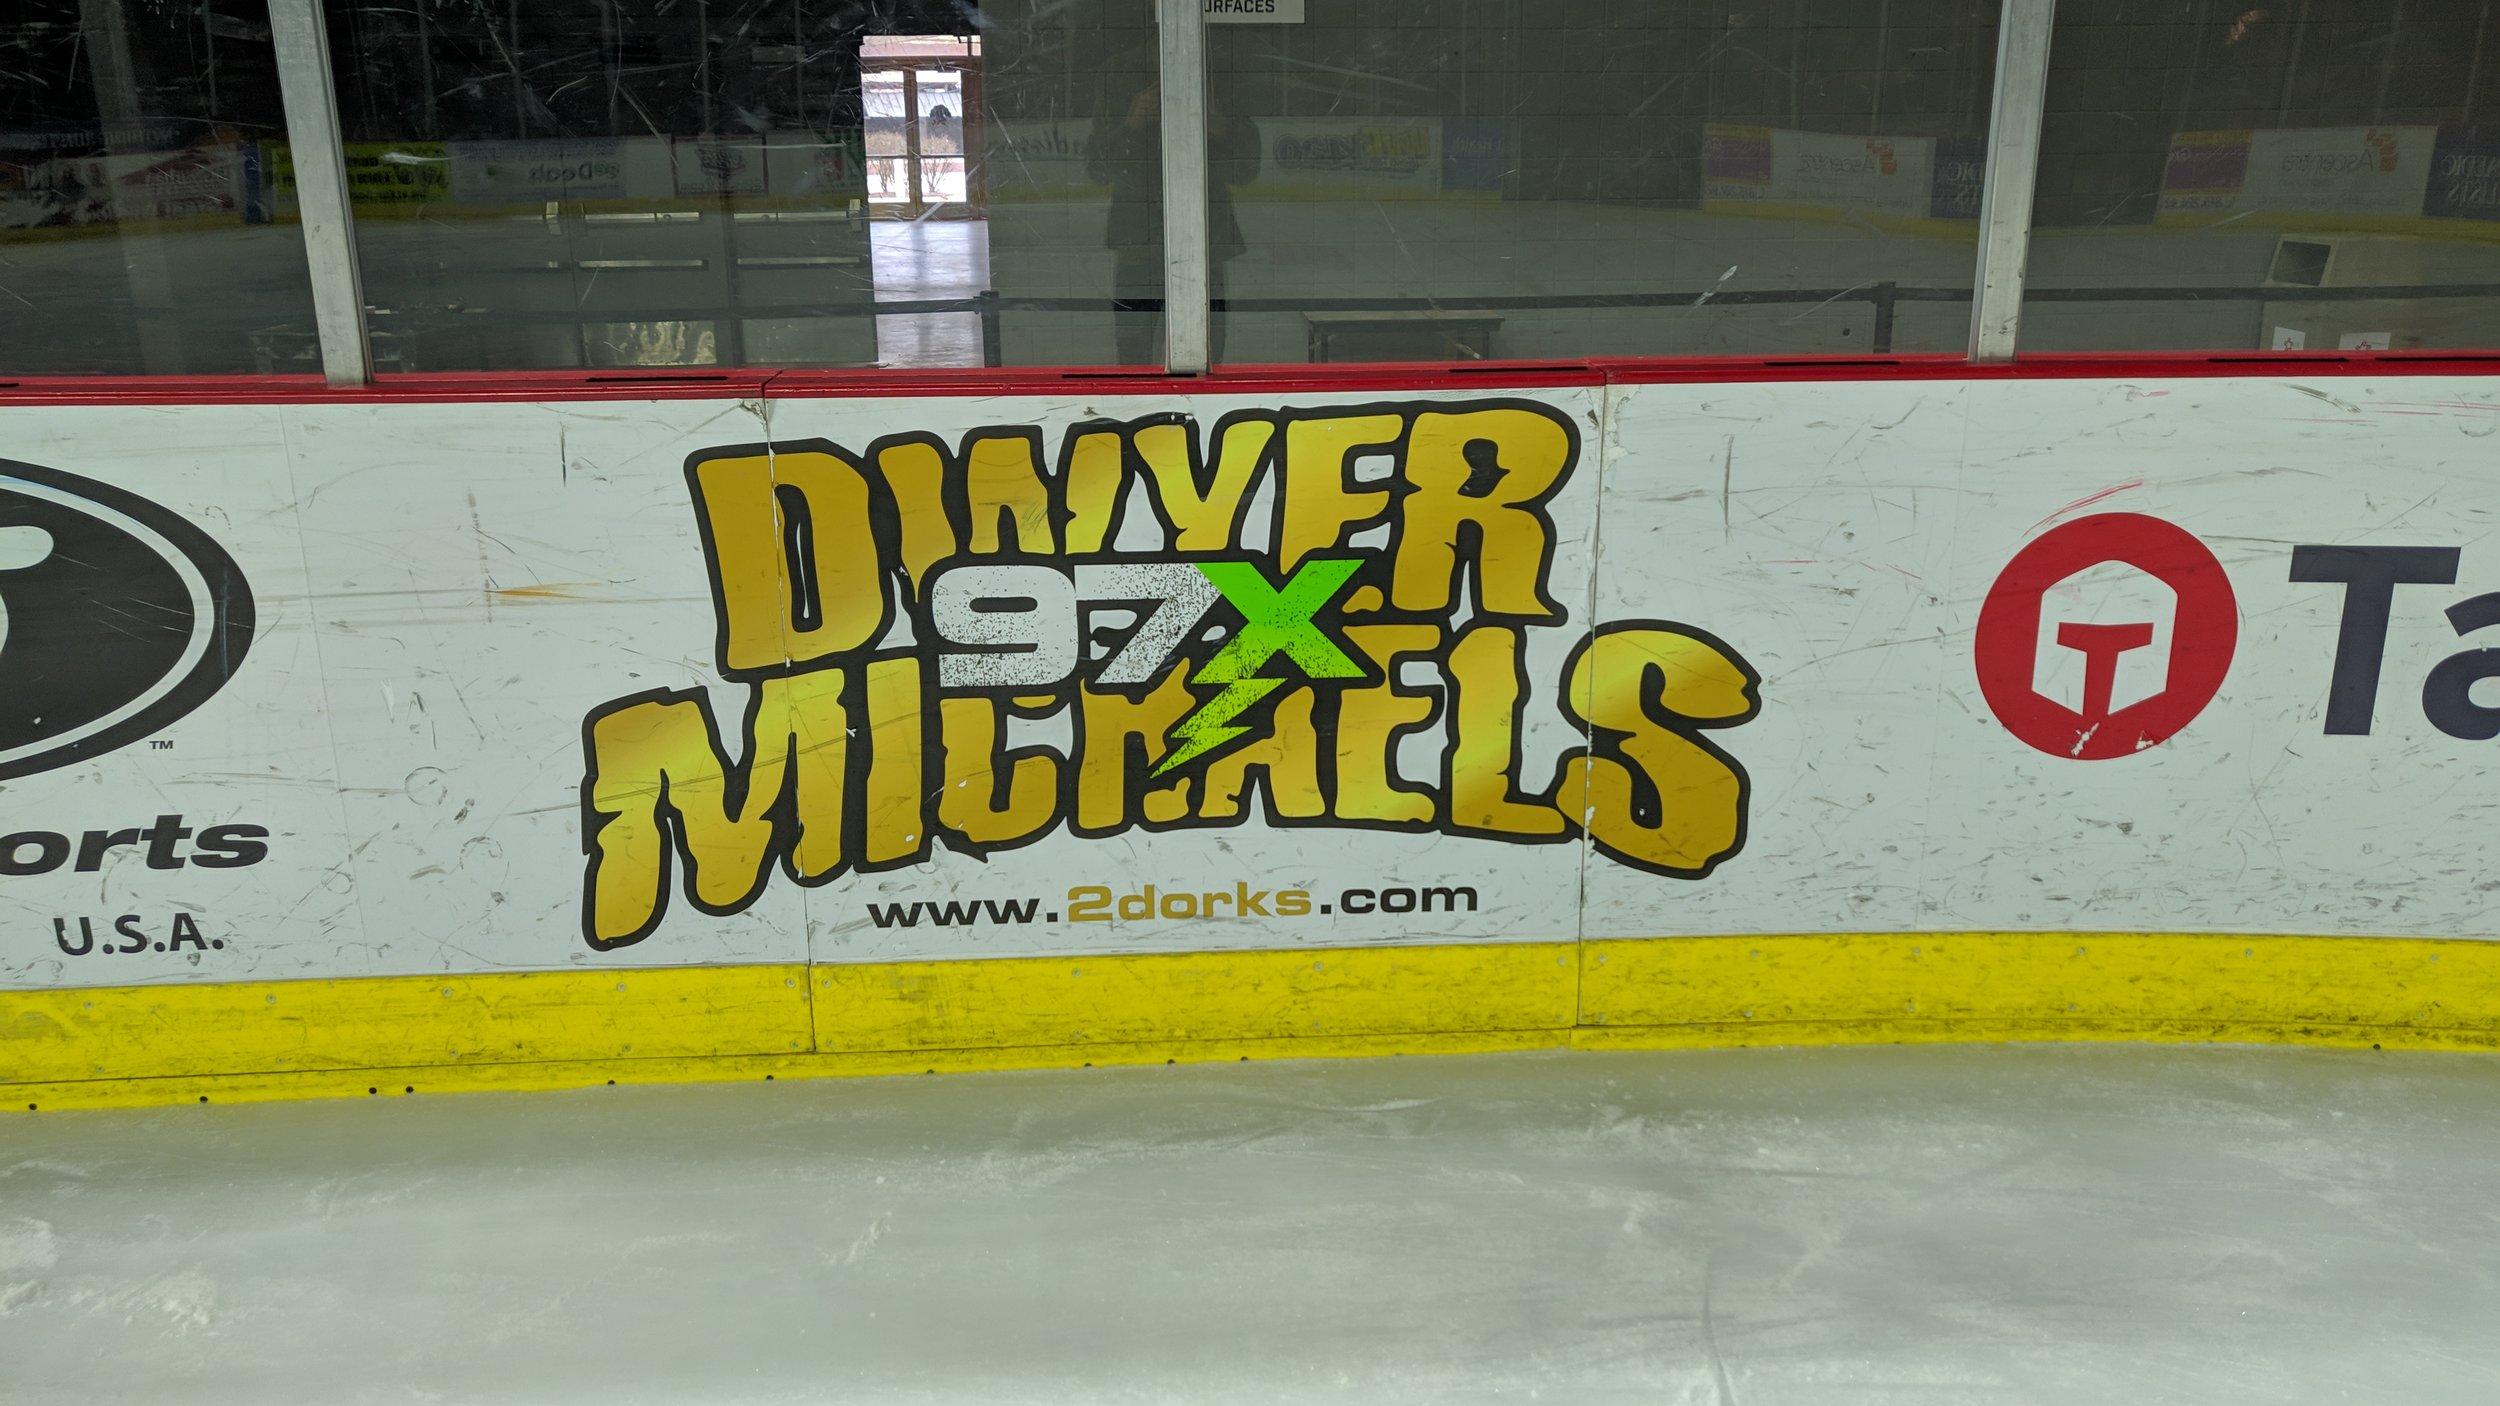 Dwyer & Michaels.jpg